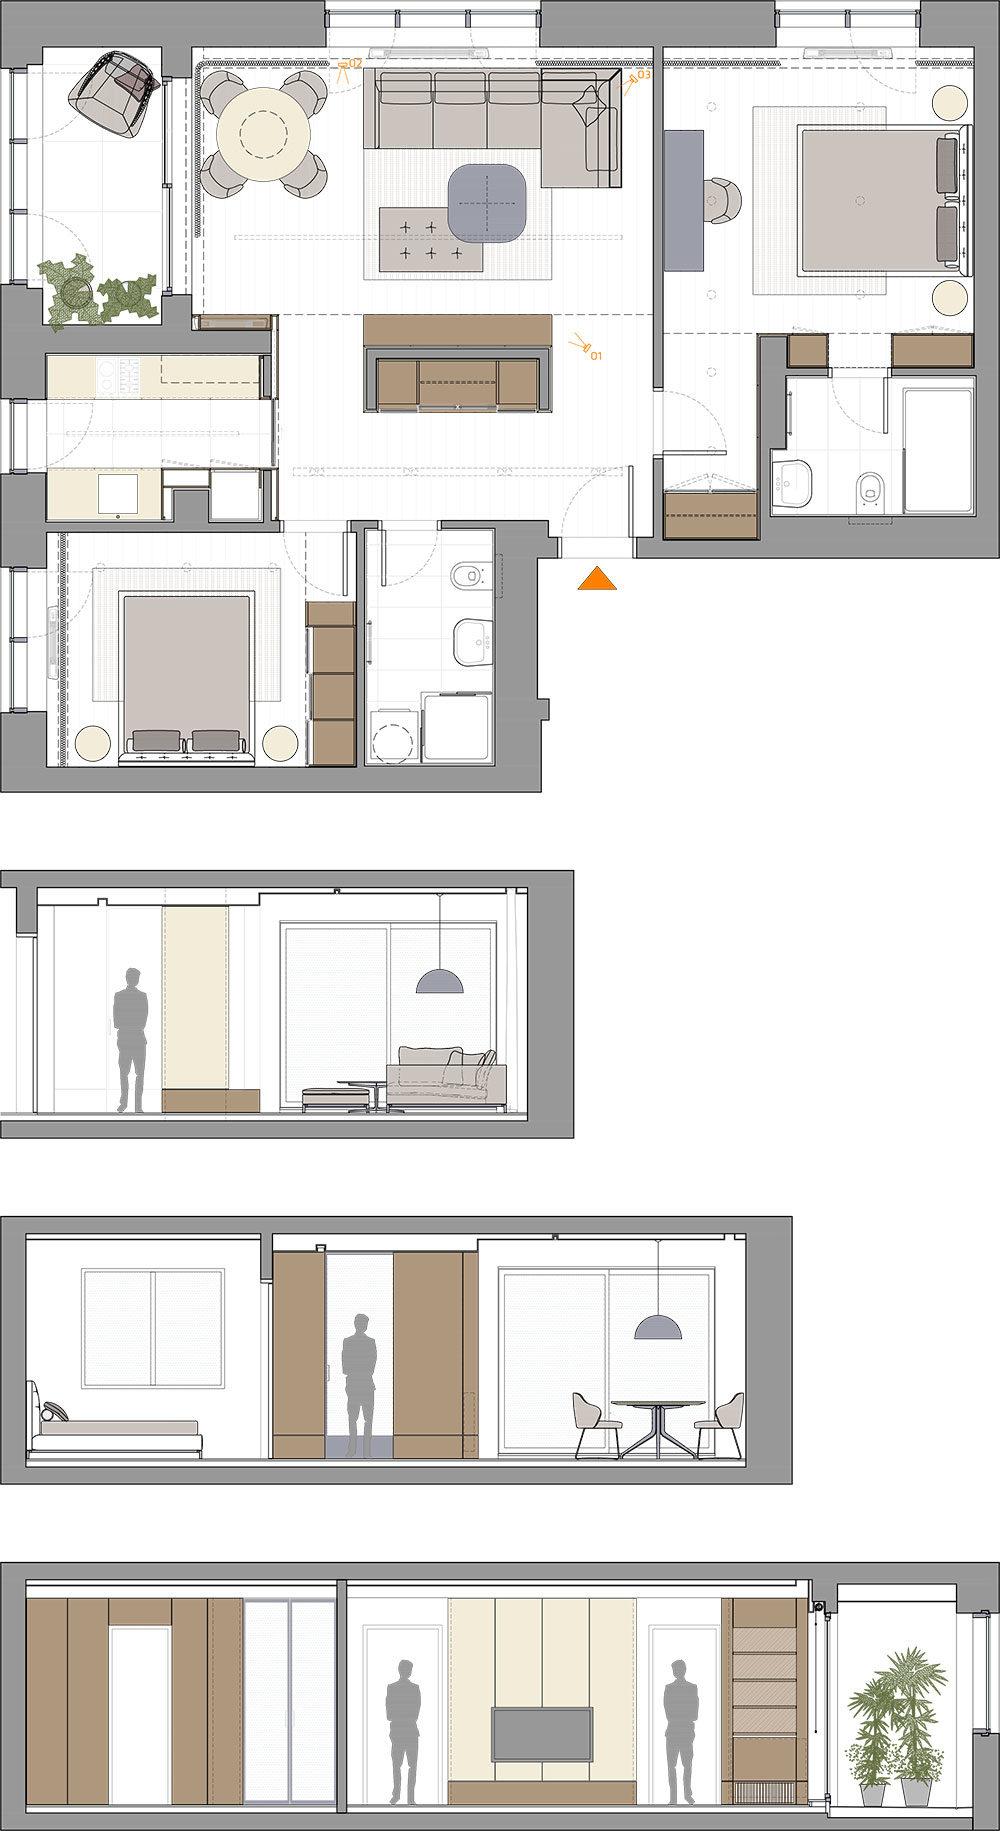 apartment-vb-02-drawing